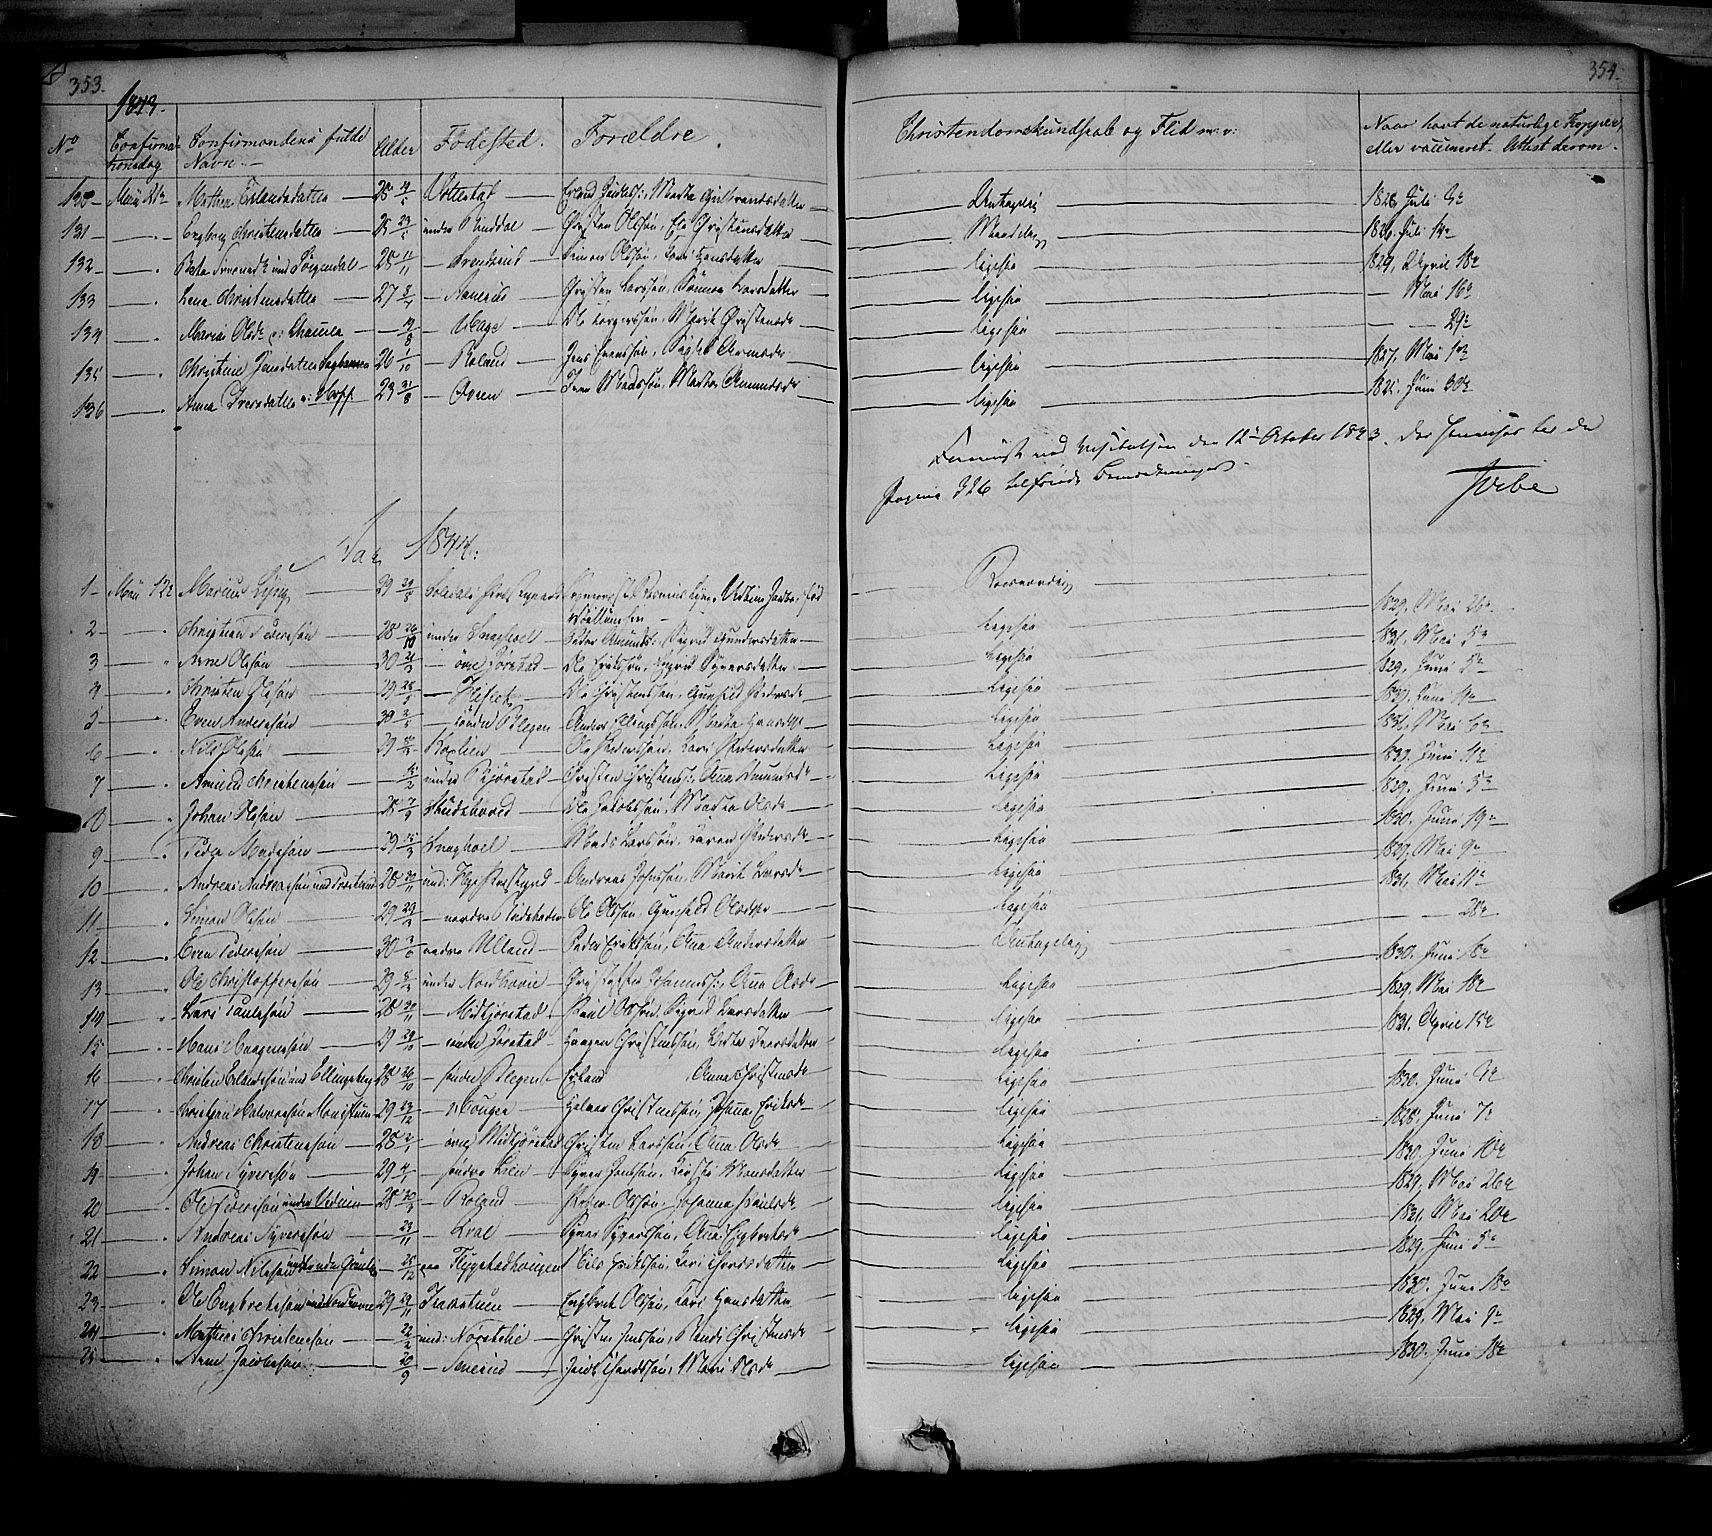 SAH, Fåberg prestekontor, Ministerialbok nr. 5, 1836-1854, s. 353-354